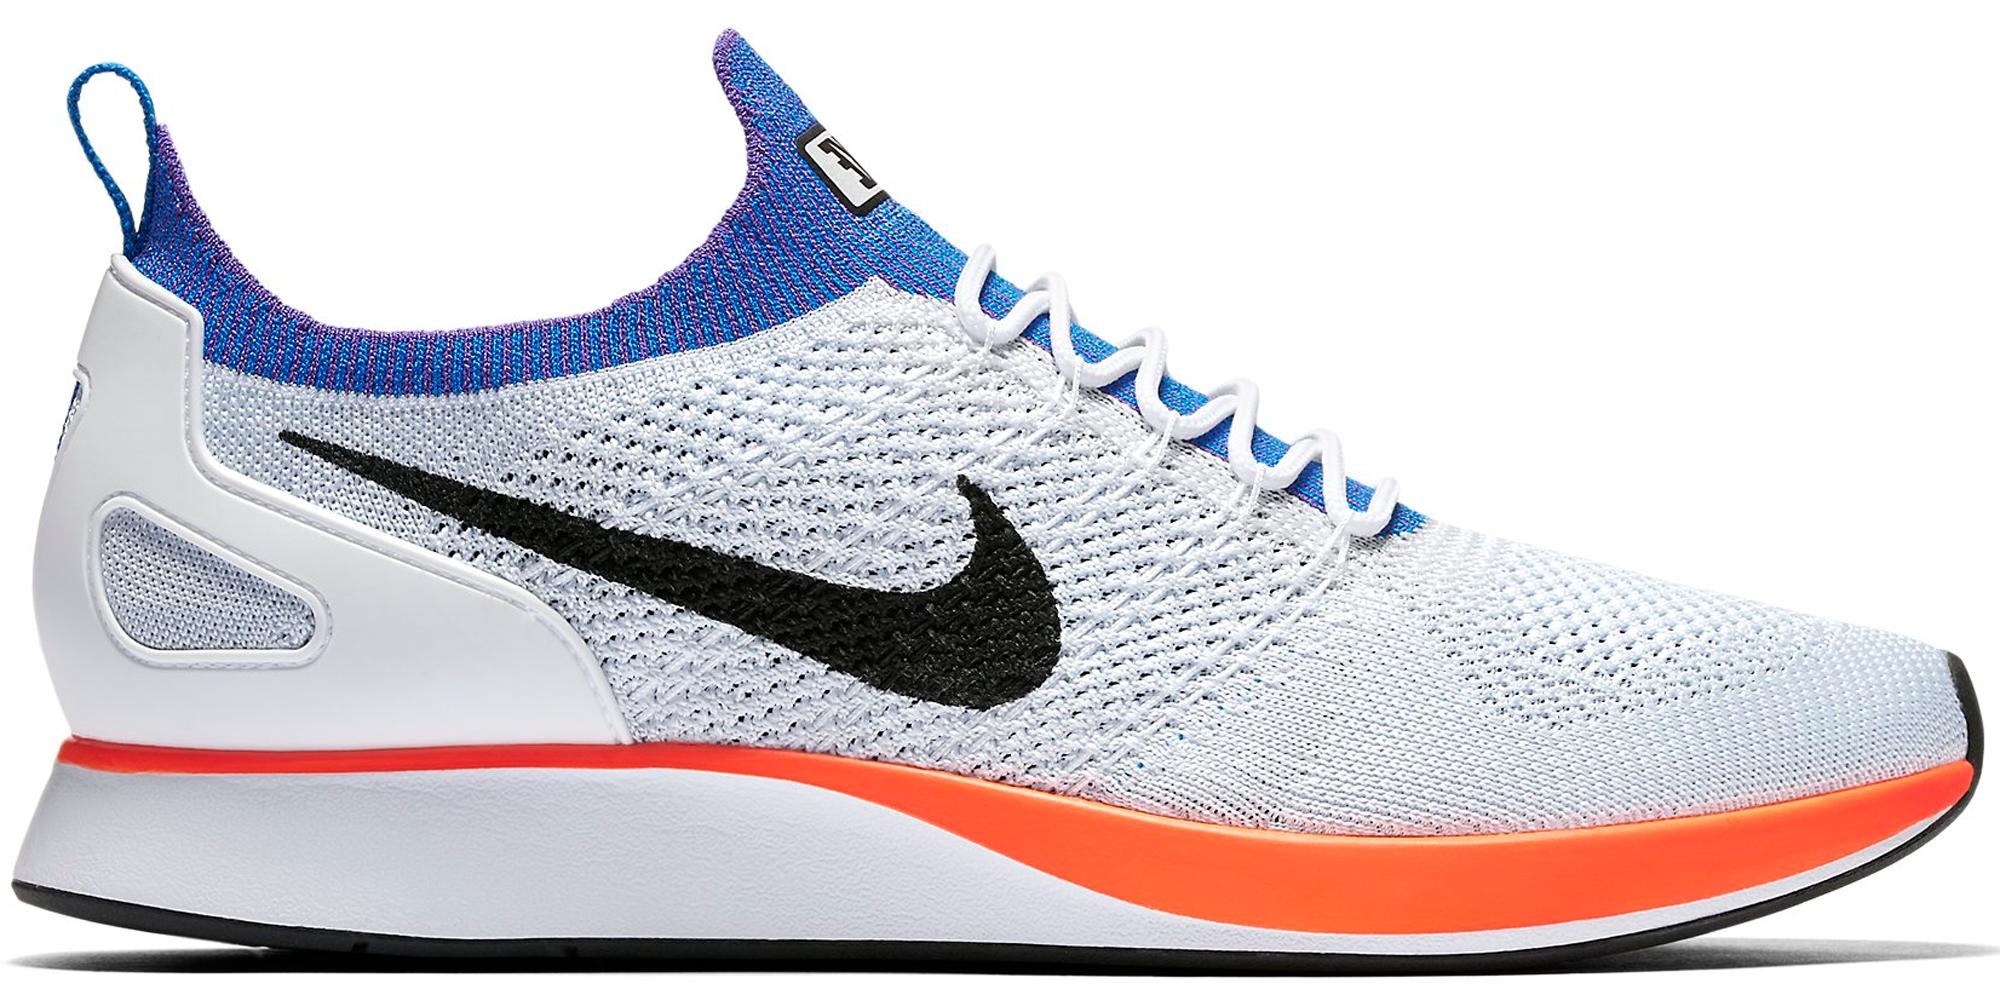 Nike Air Zoom Mariah Flyknit Racer Premium Hyper Crimson - StockX News e9c777770